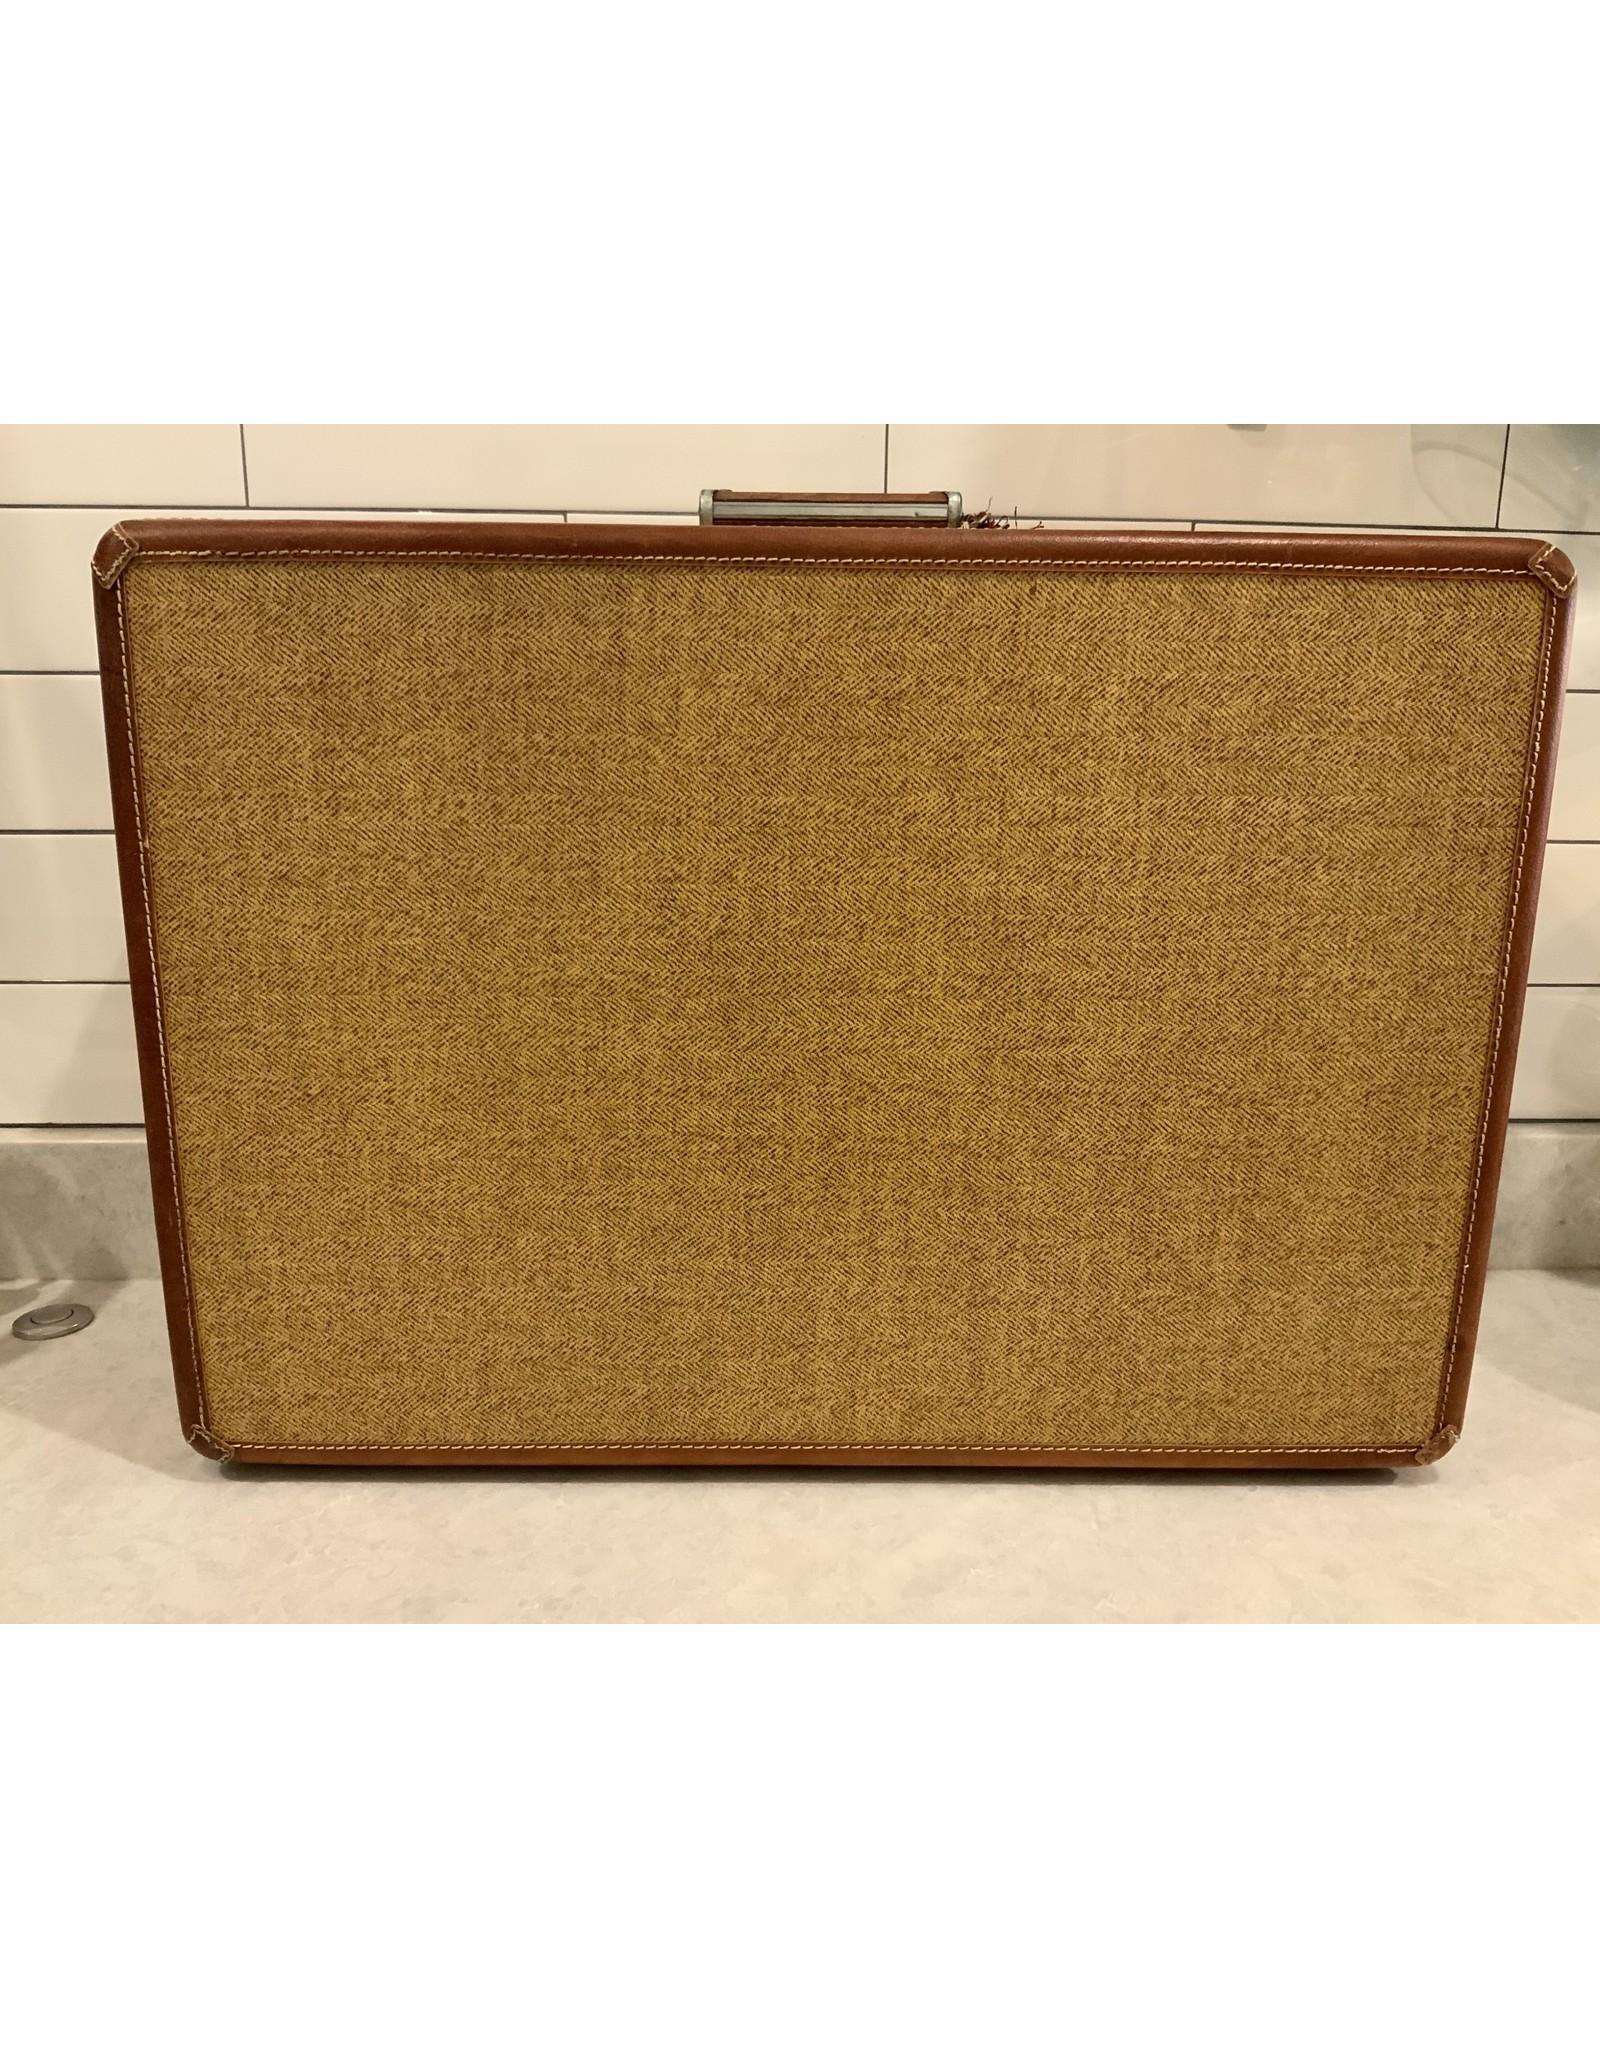 SPV 1950s Wheary Luggage set